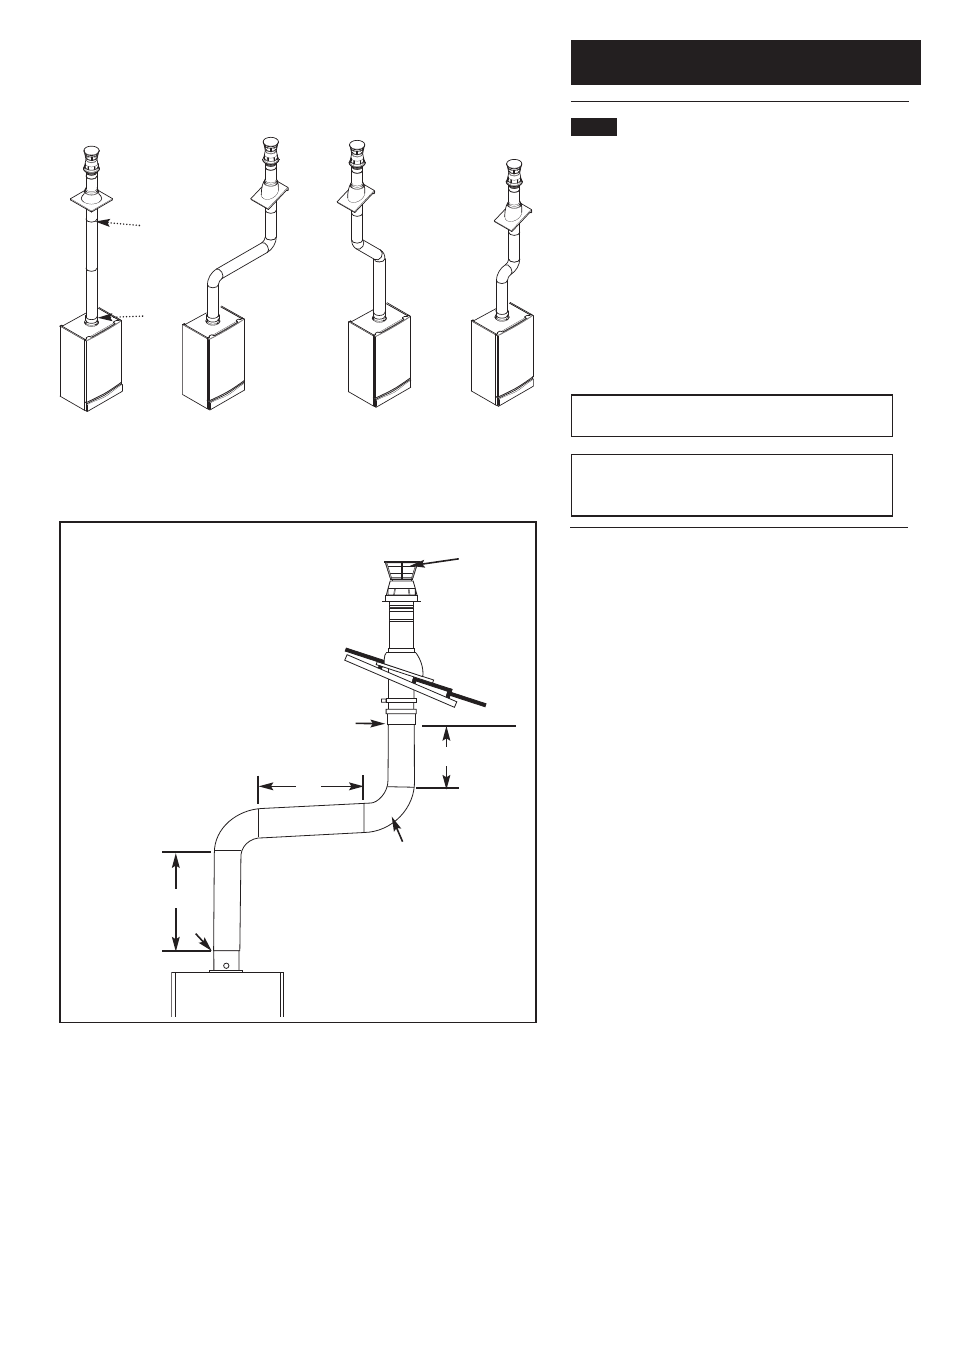 0 flue options baxi potterton heatmax combi he condensing 0 flue options baxi potterton heatmax combi he condensing combination boiler user manual page asfbconference2016 Images